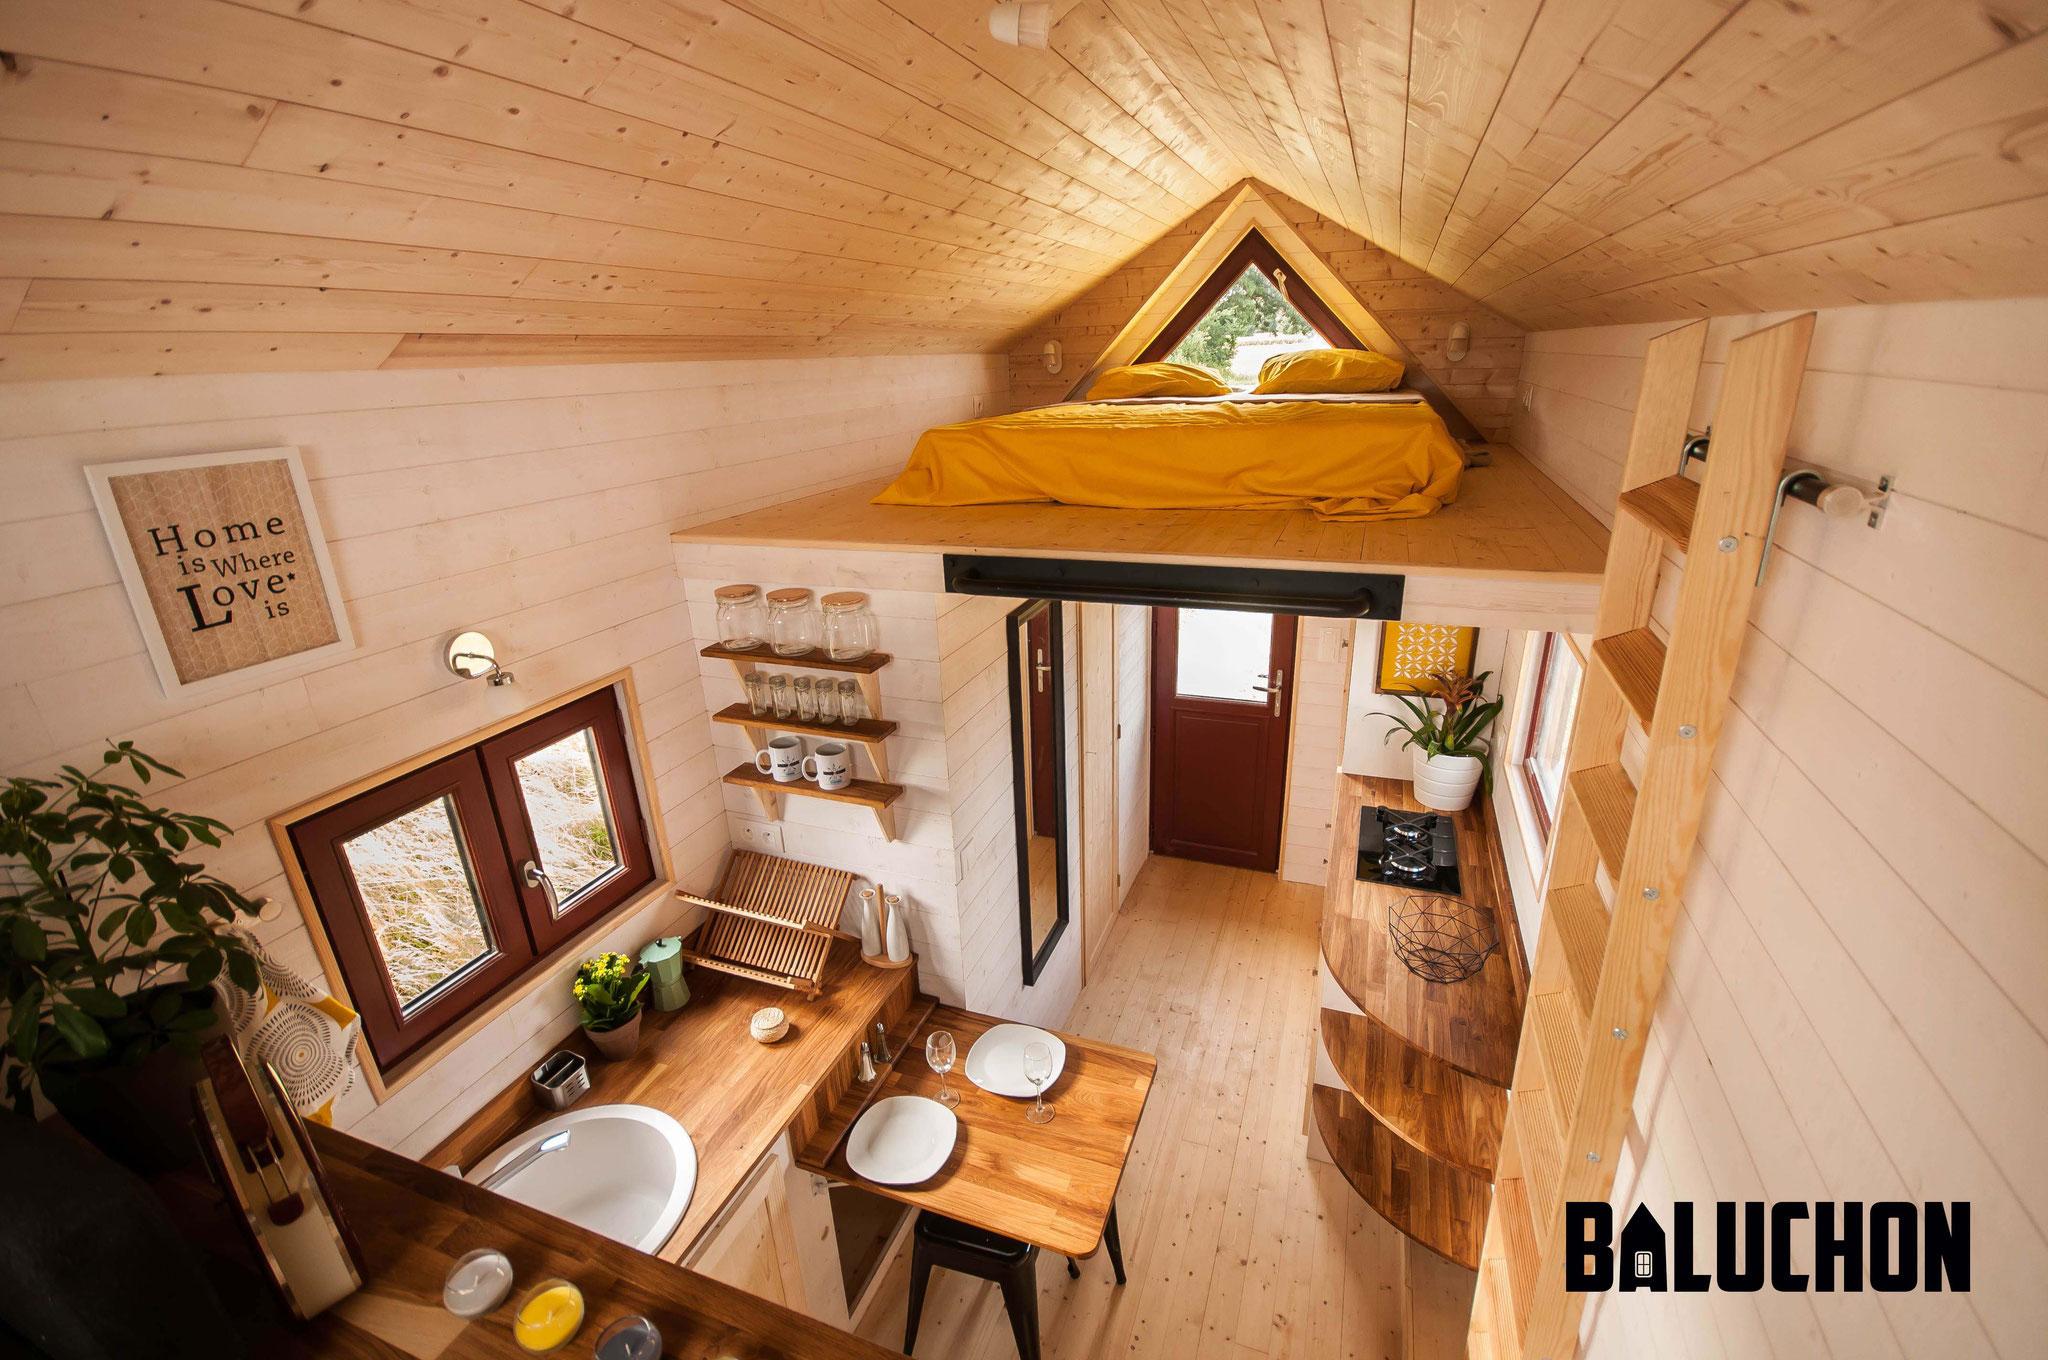 L'Odyssée - French Tiny House - Interior 2